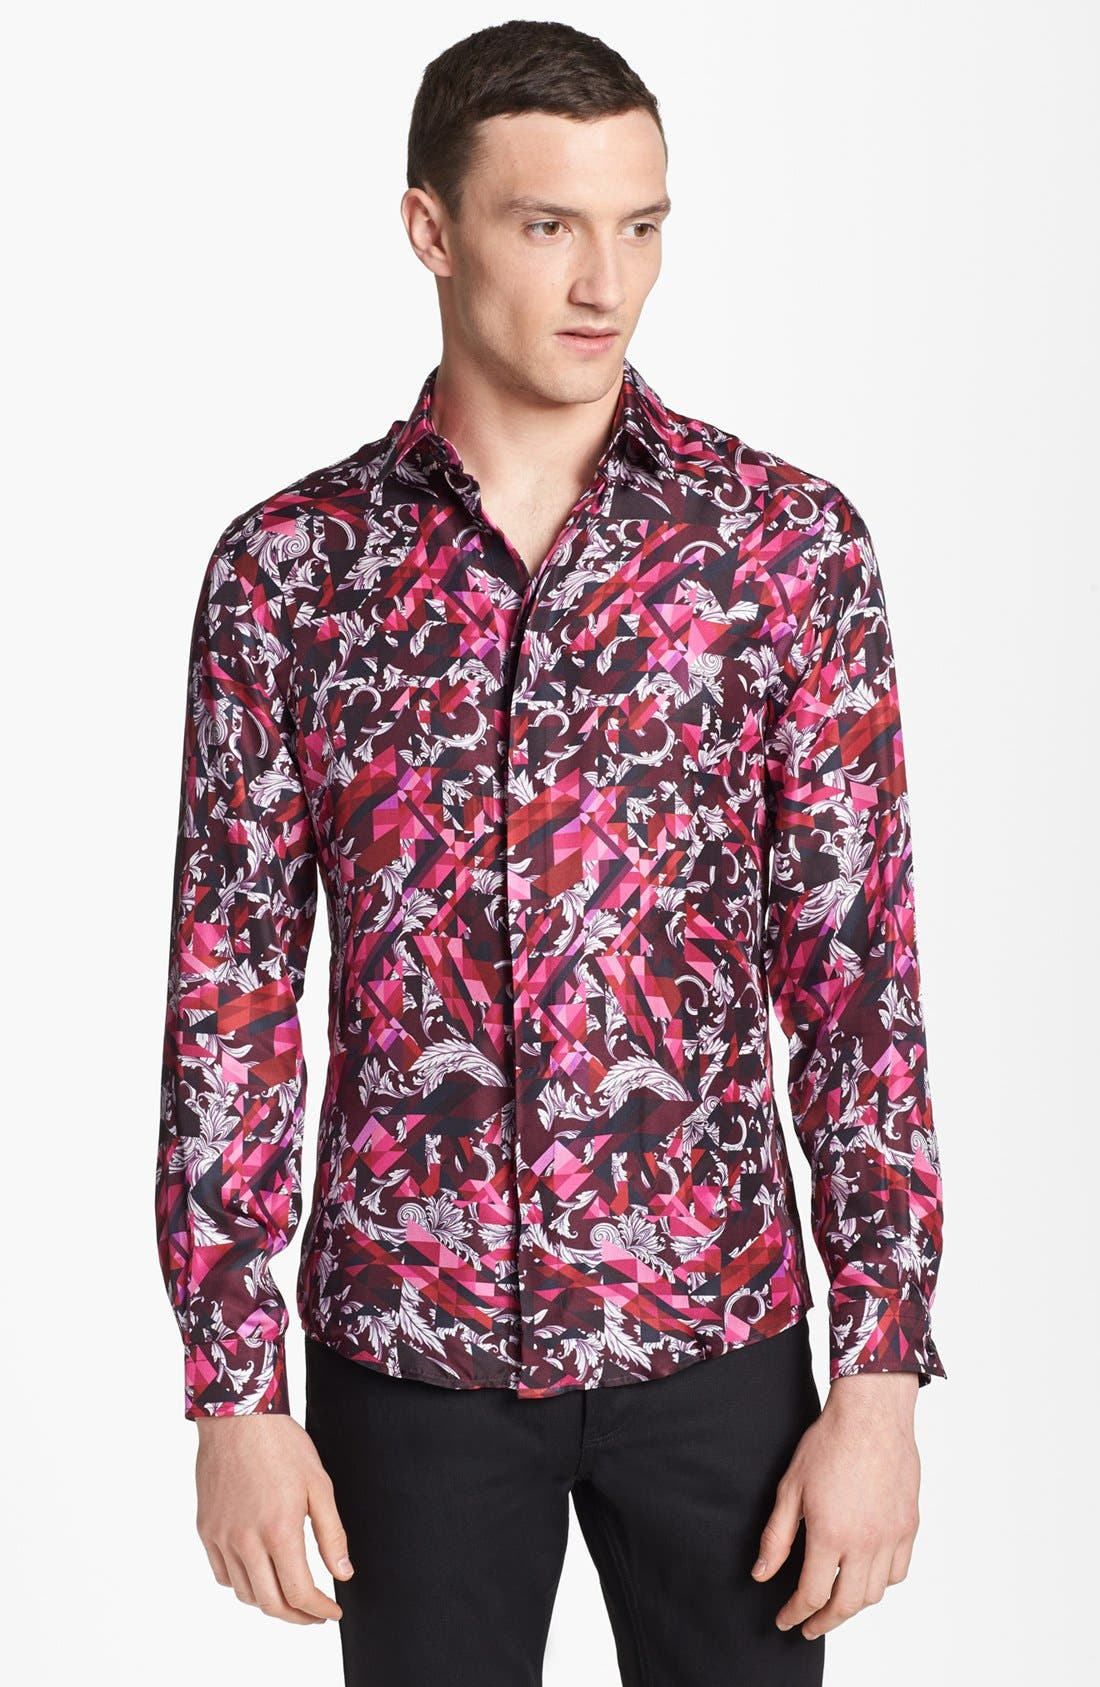 Alternate Image 1 Selected - Versace Allover Geometric Print Woven Silk Shirt